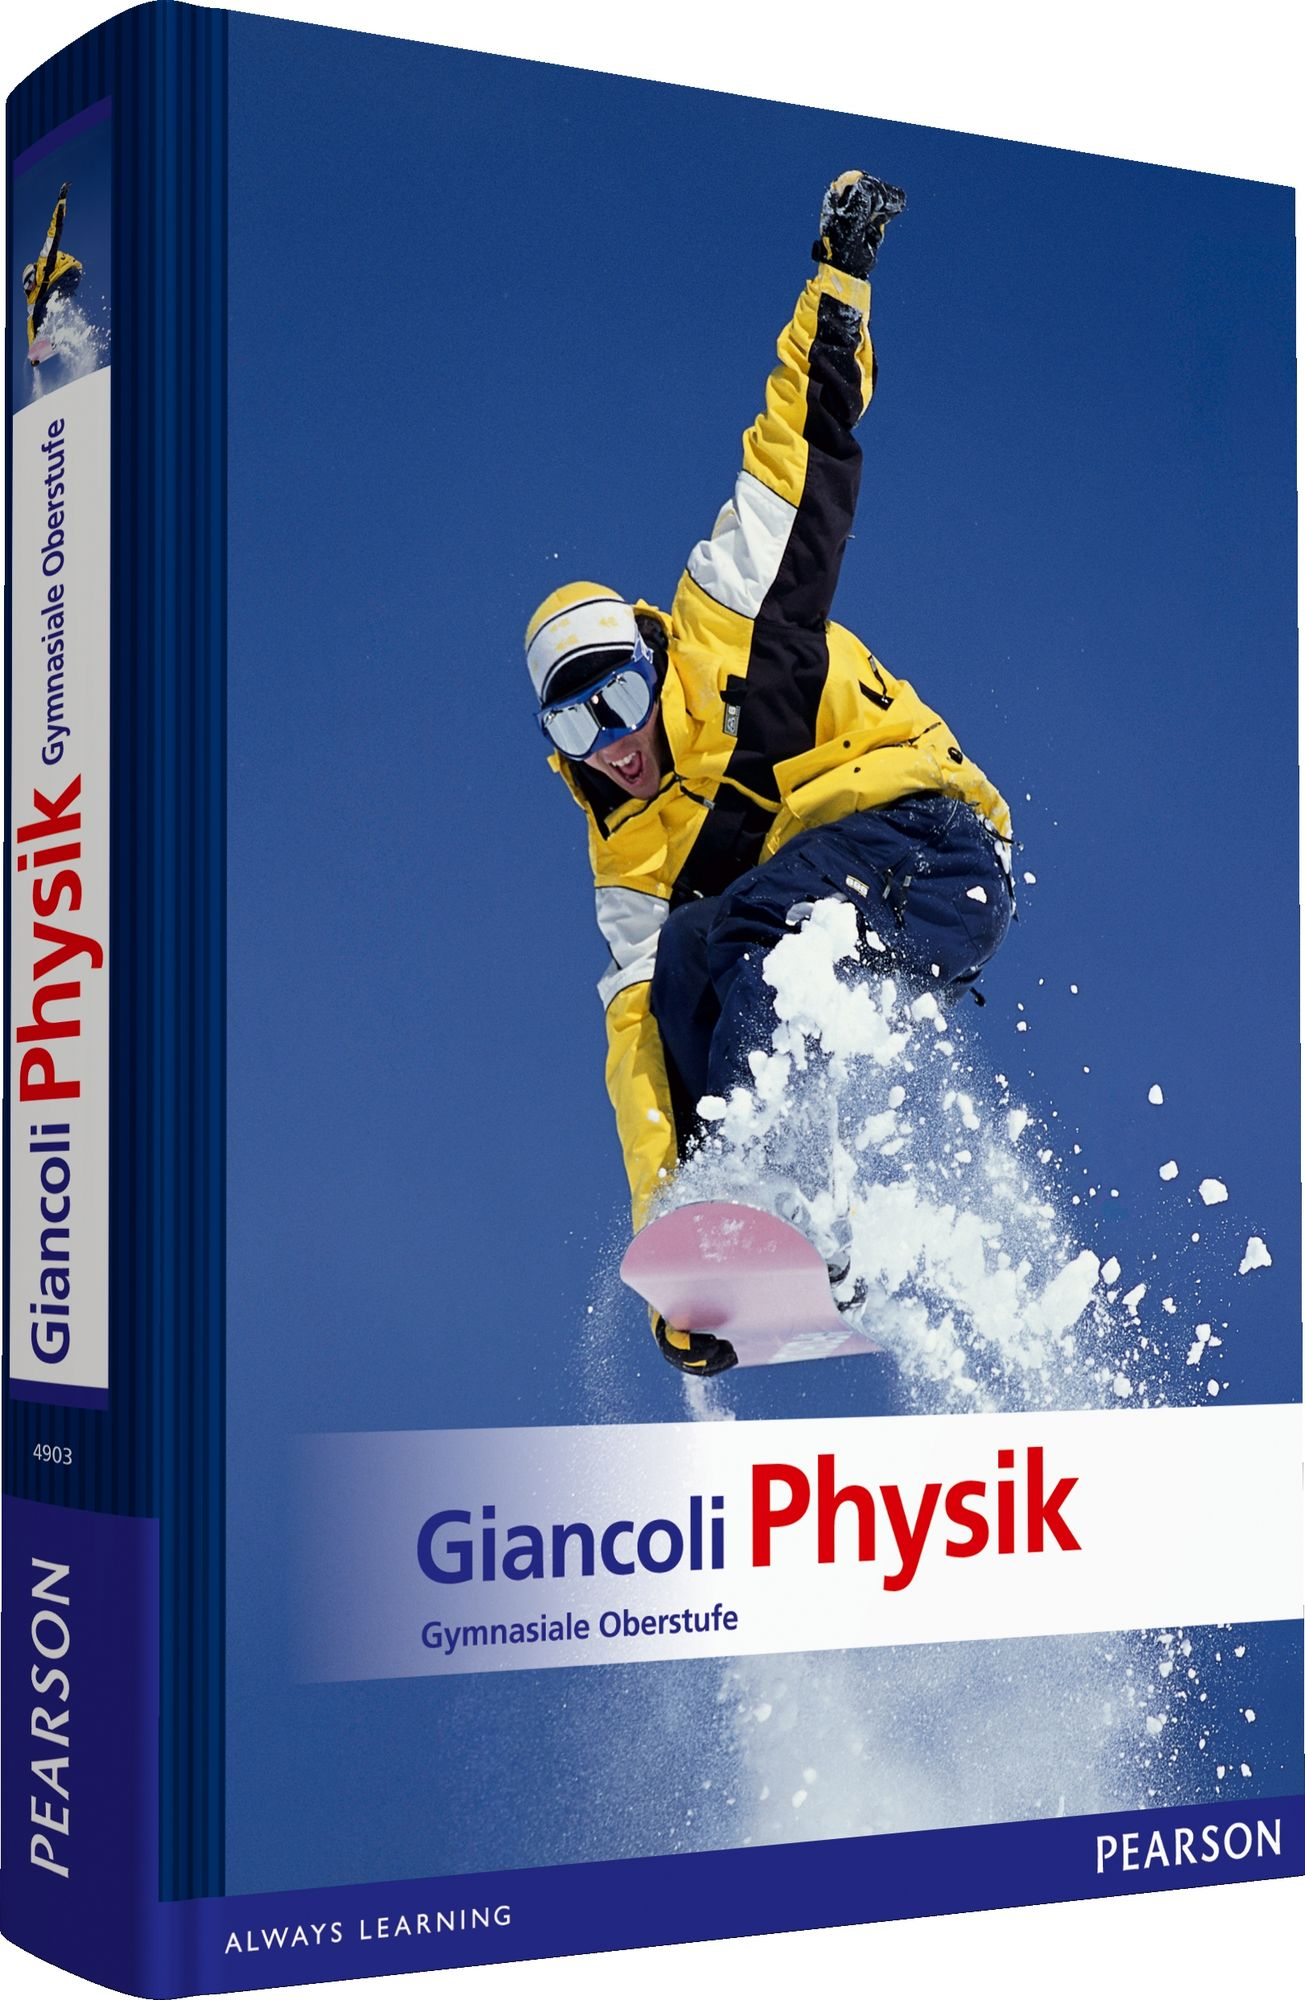 Physik: Gymnasiale Oberstufe - Douglas C. Giancoli